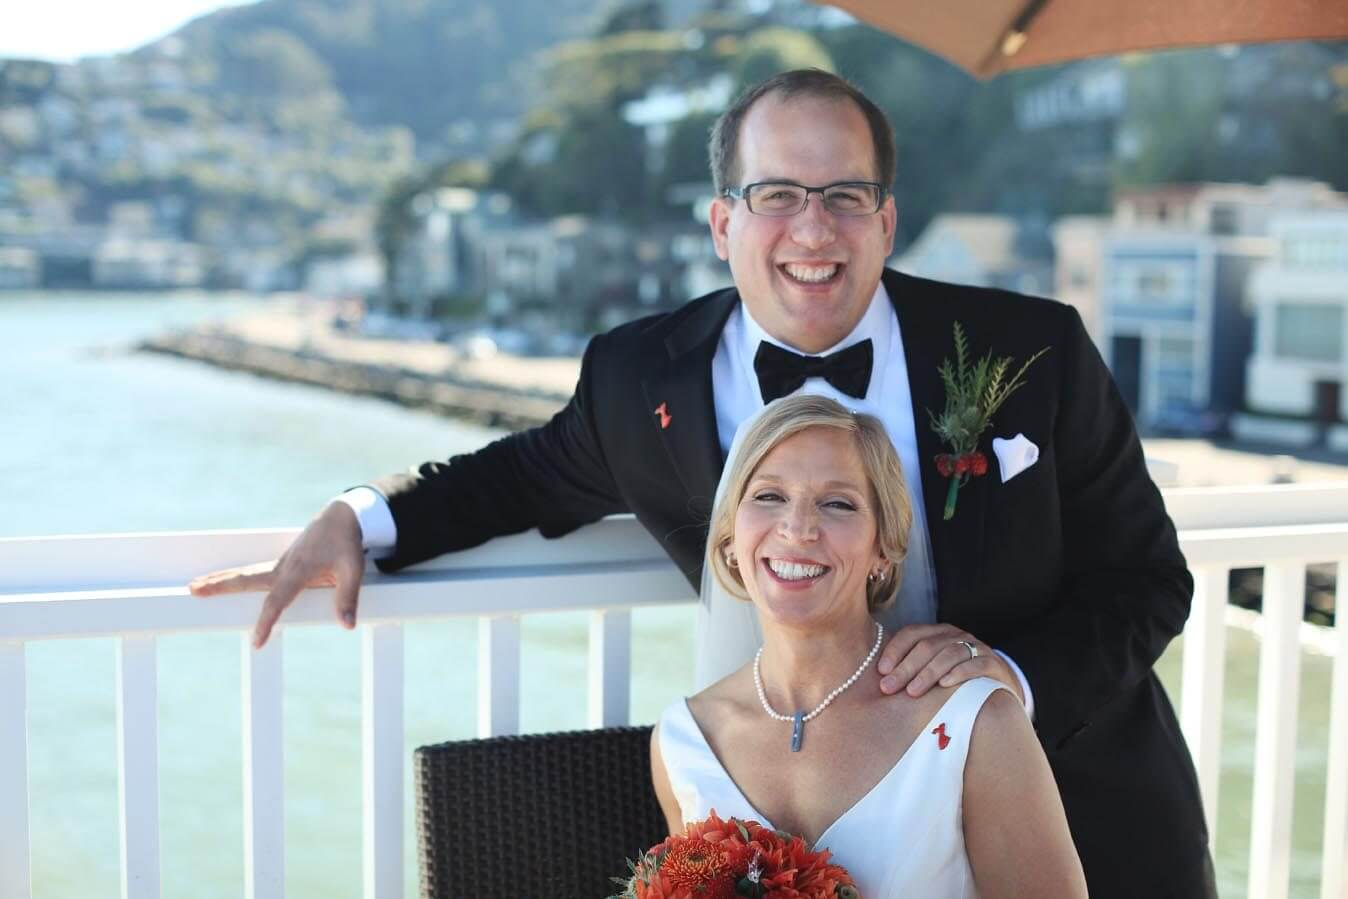 Darrel and Janet wedding